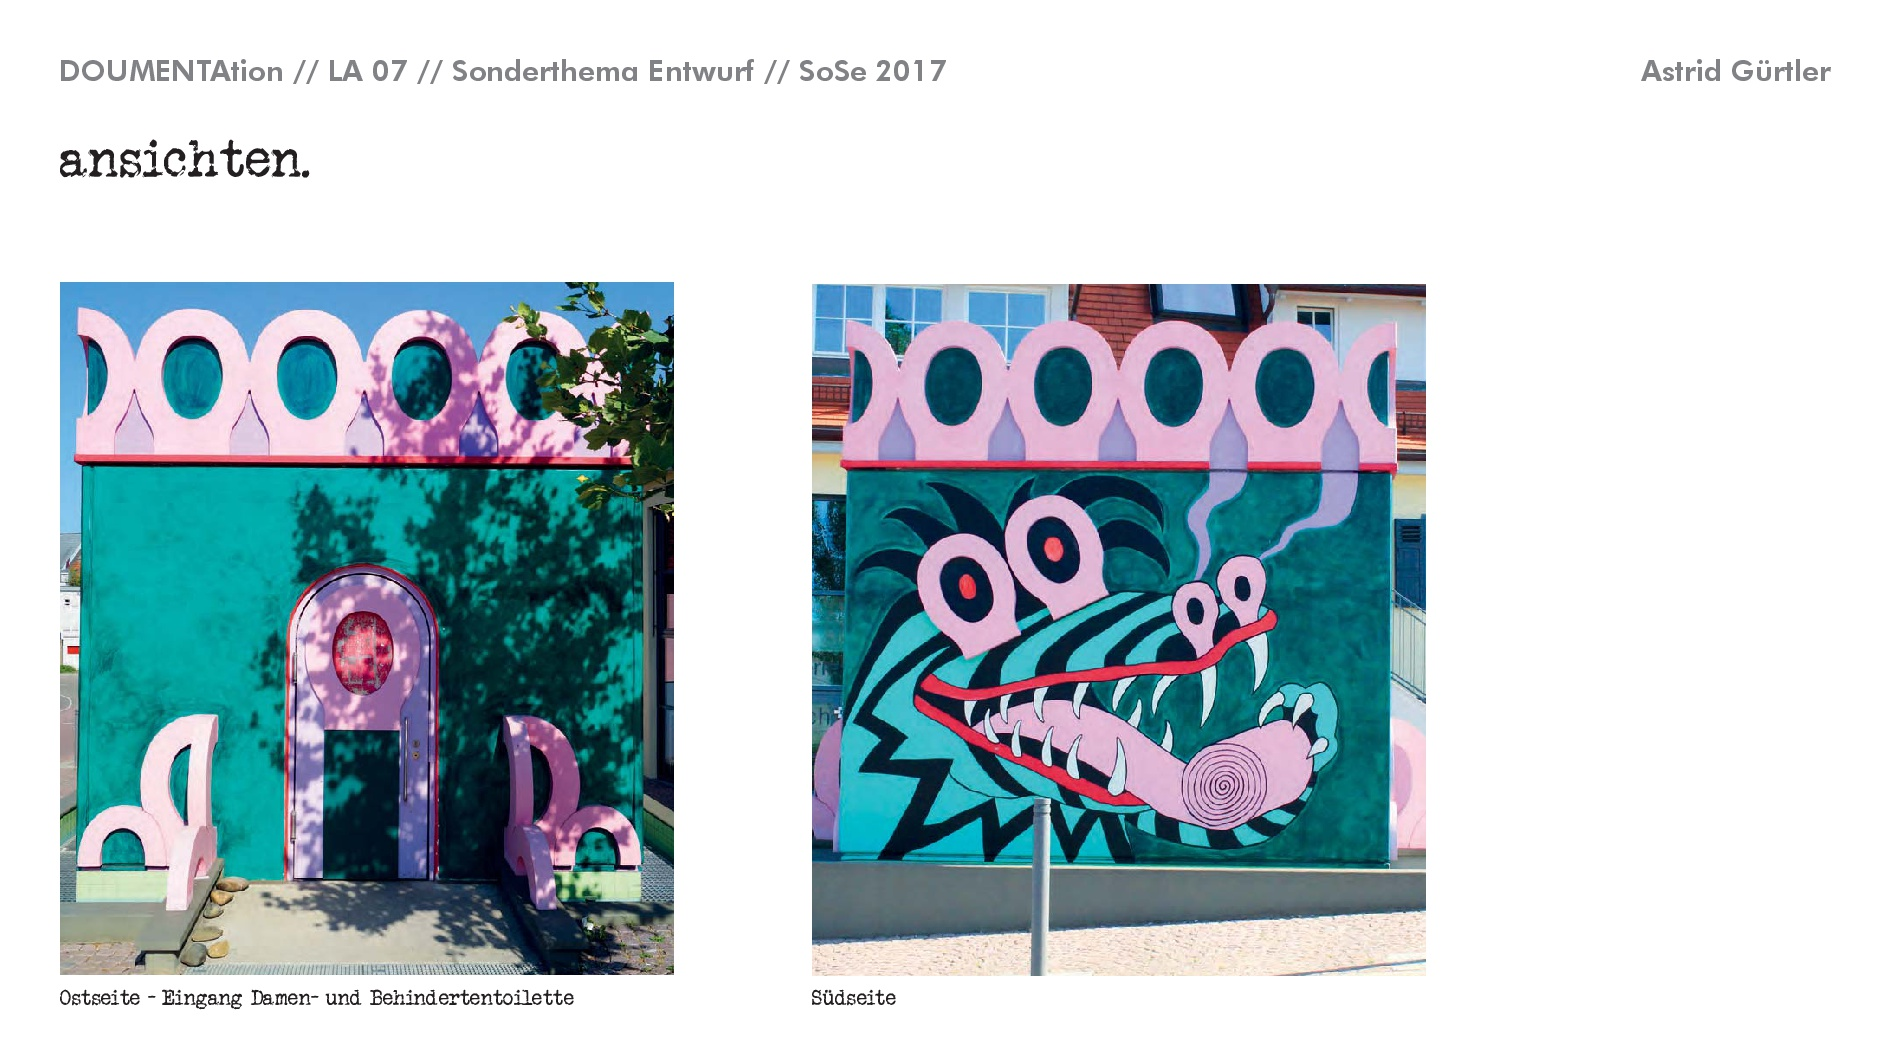 NEU Sonderthema Entwerfen SoSe 17 028